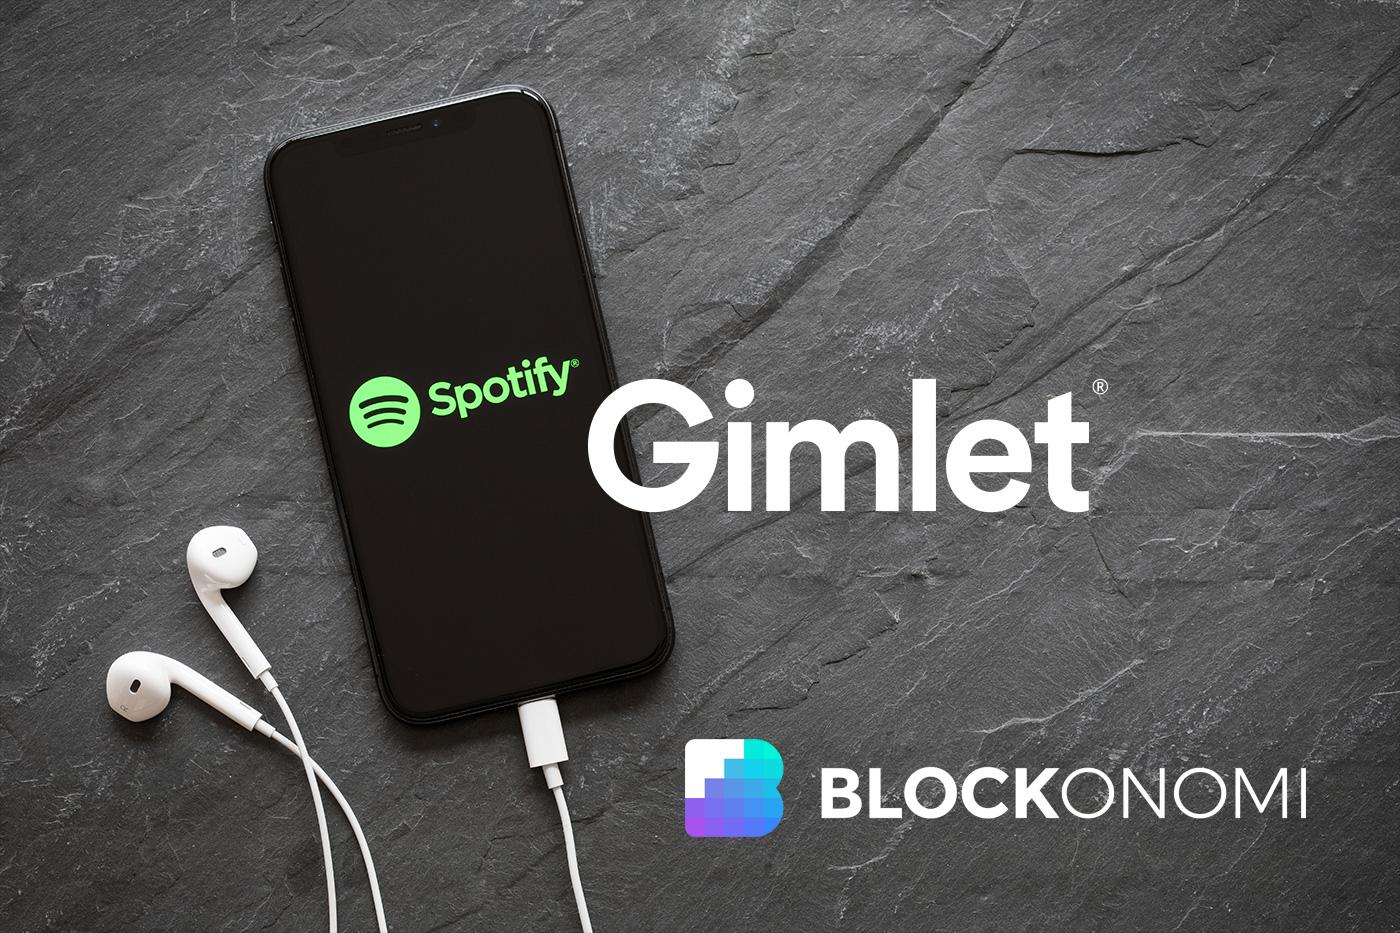 Spotify Gimlet Media